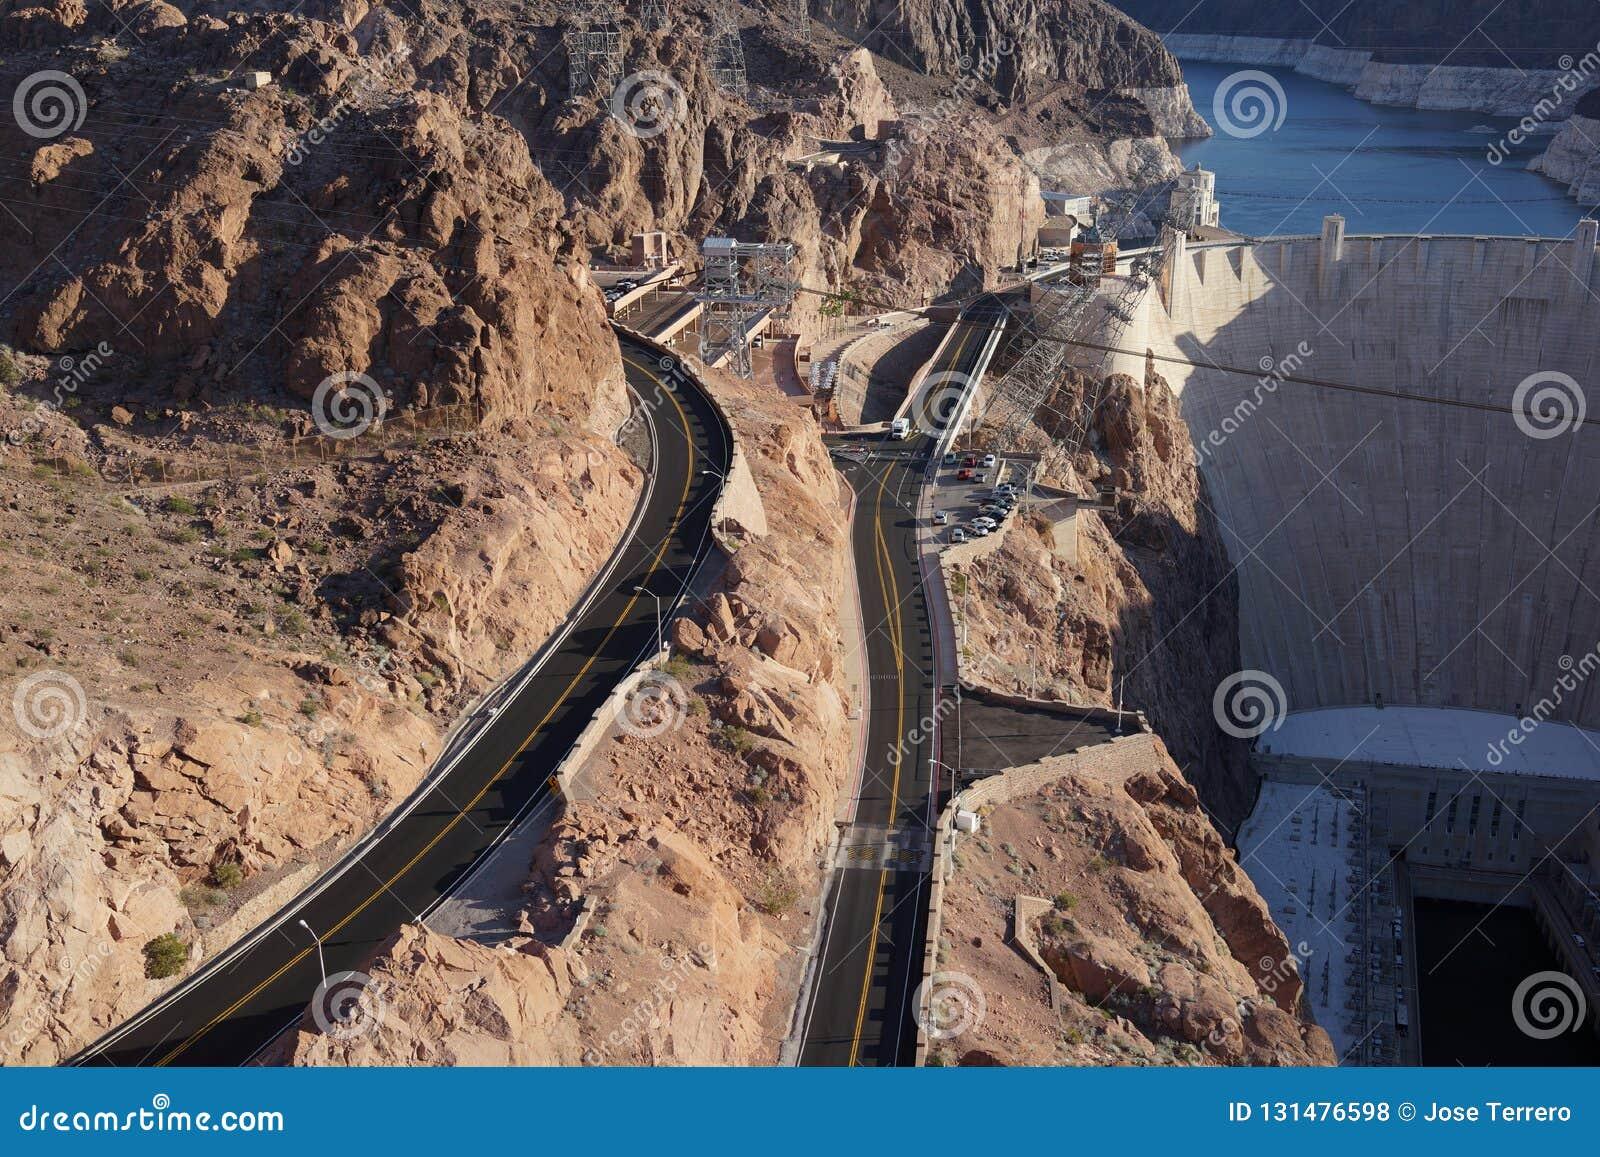 The Hoover Dam 27 editorial stock photo  Image of herbert - 131476598